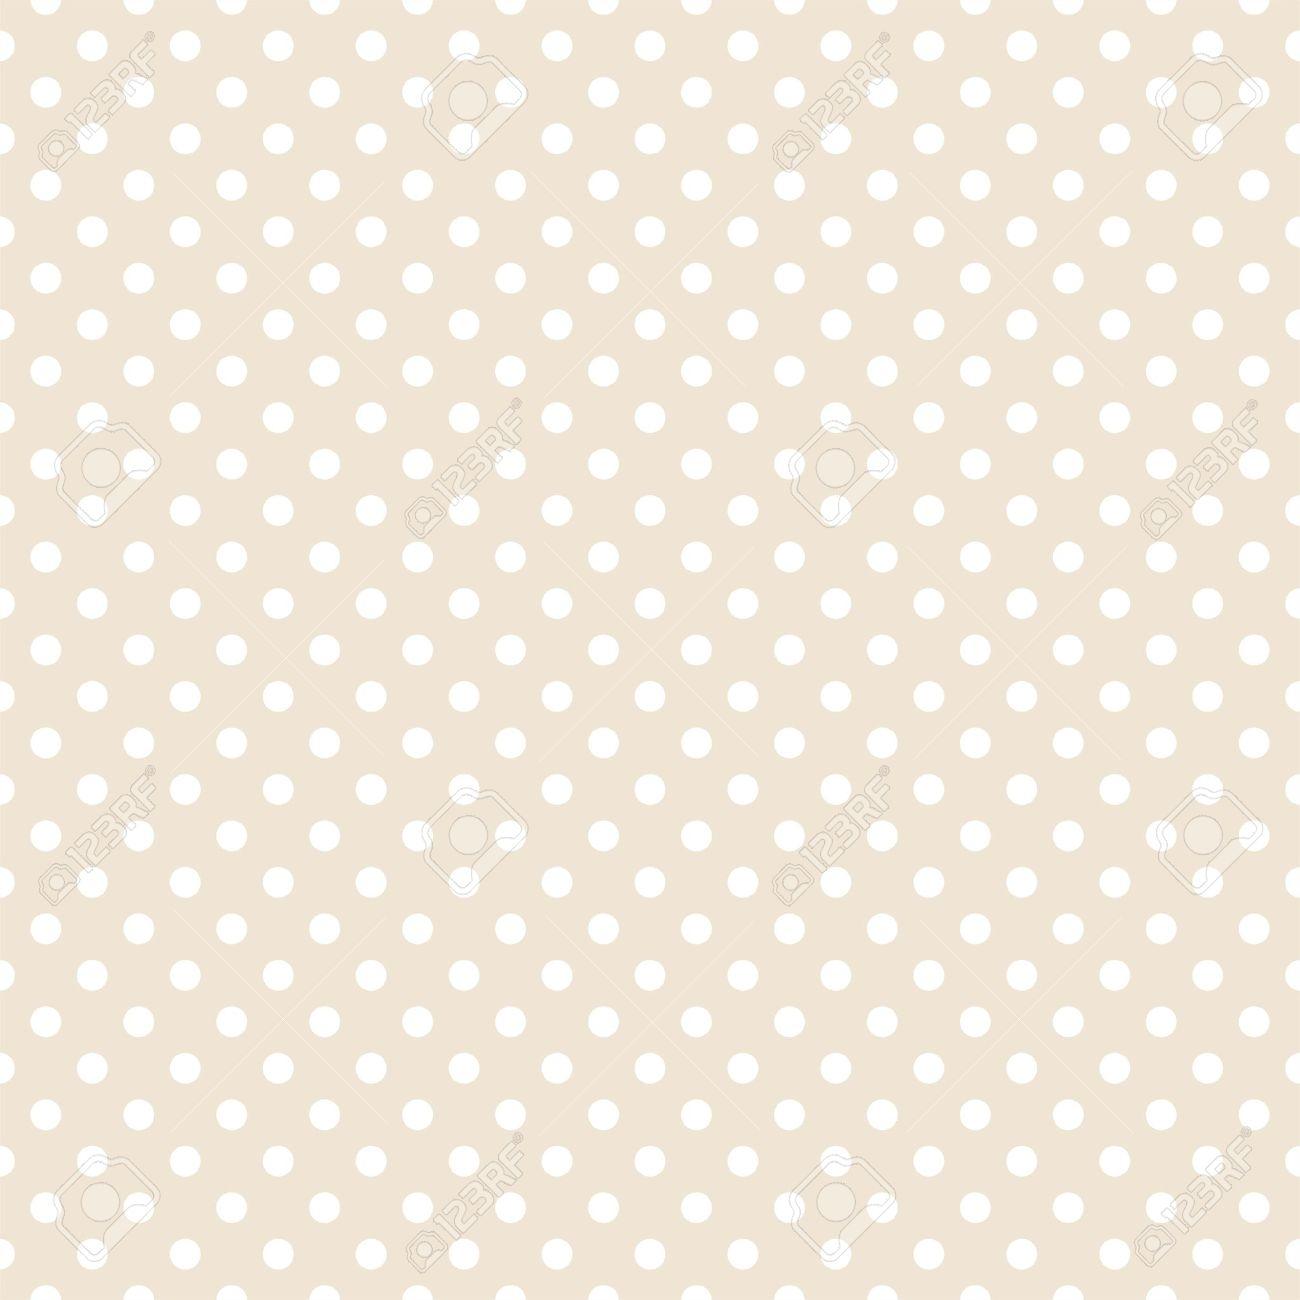 white polka dots on light beige neutral background retro seamless